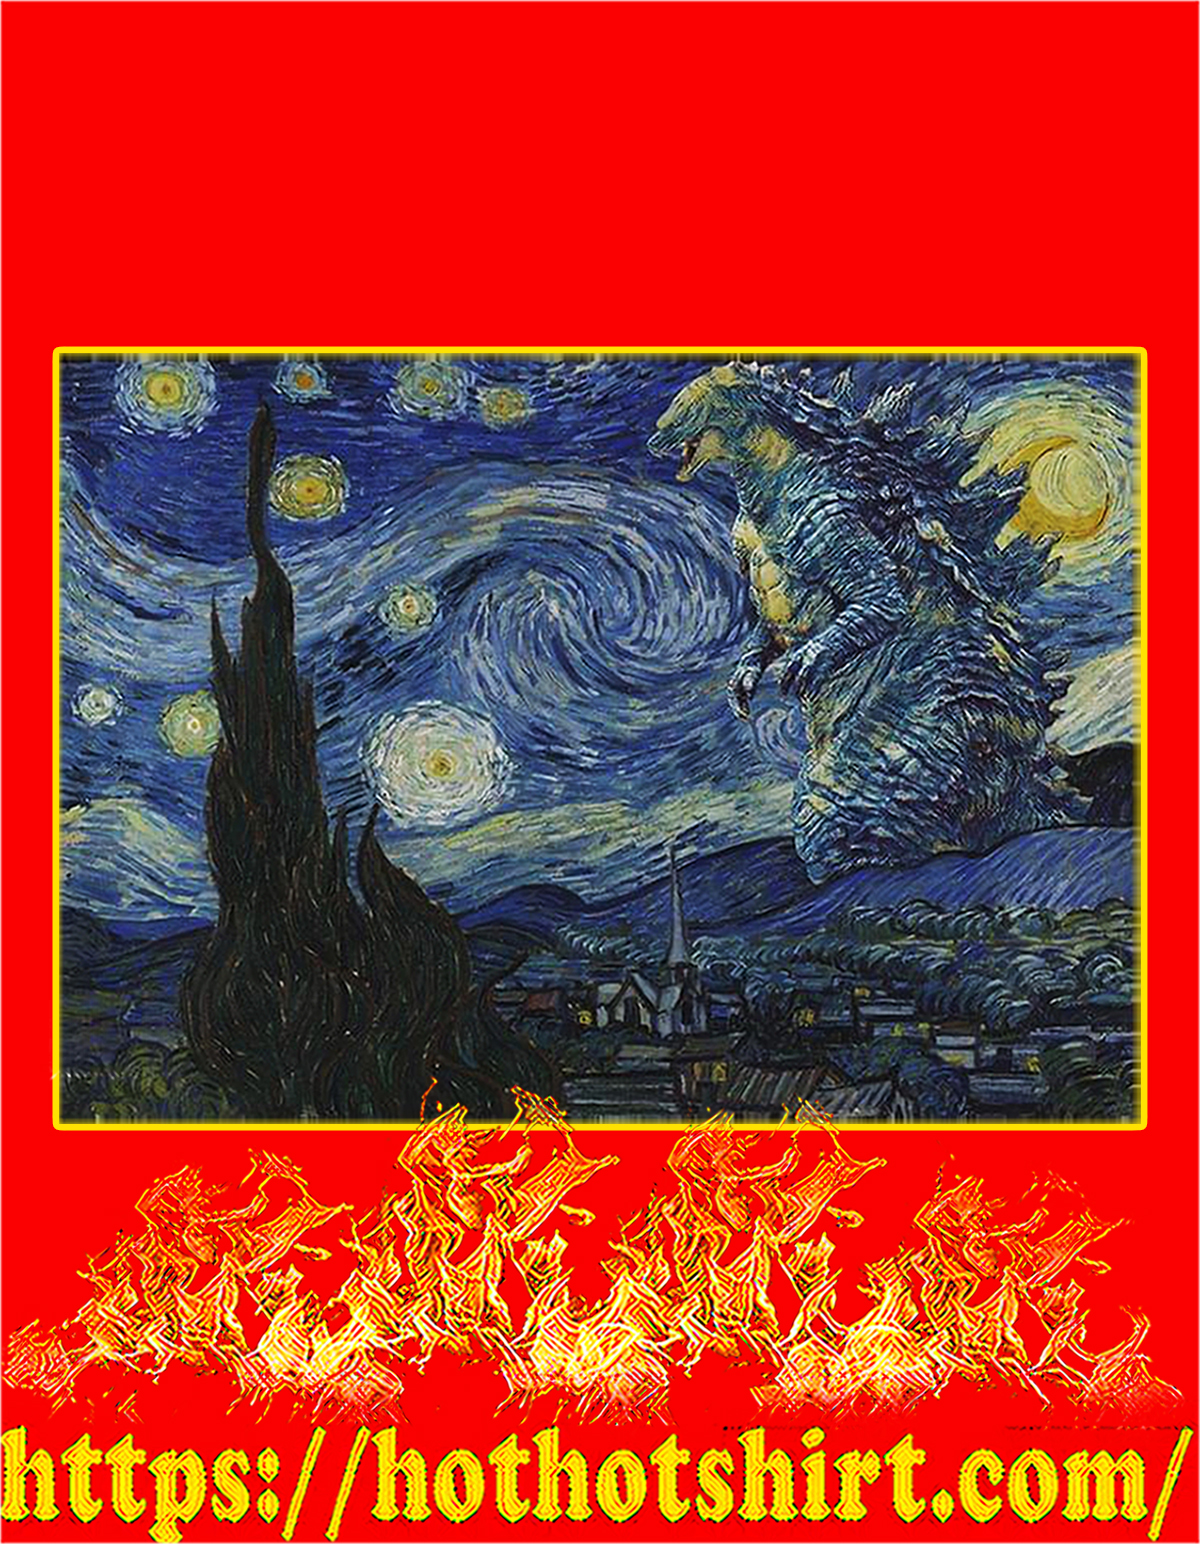 Godzzila starry night poster - A4